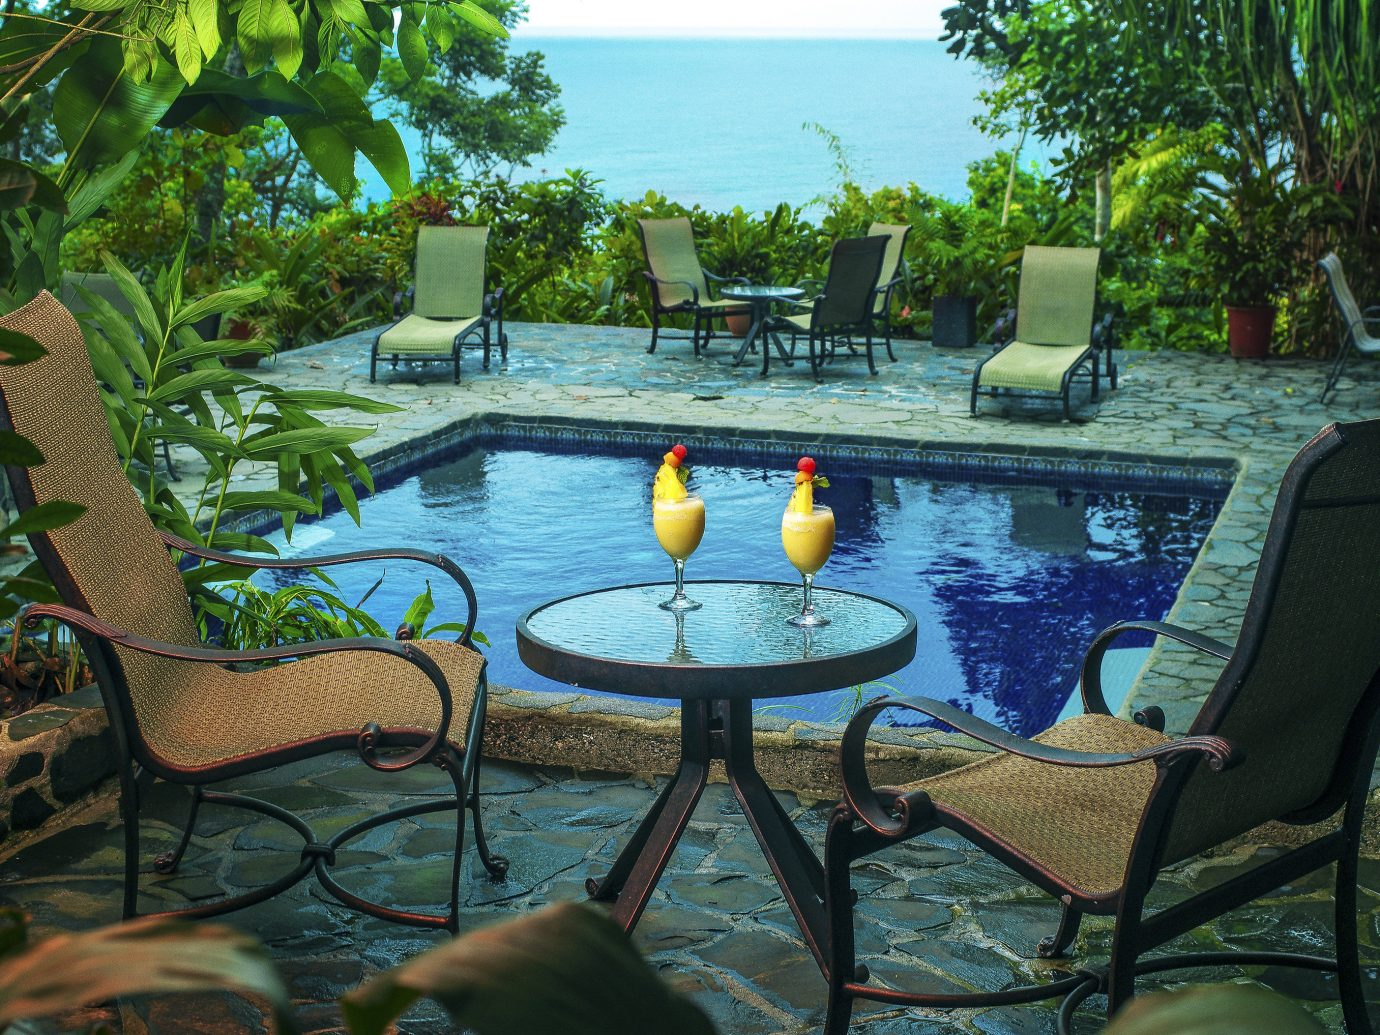 Poolside cocktails at La Paloma Lodge - Osa Peninsula in Costa Rica